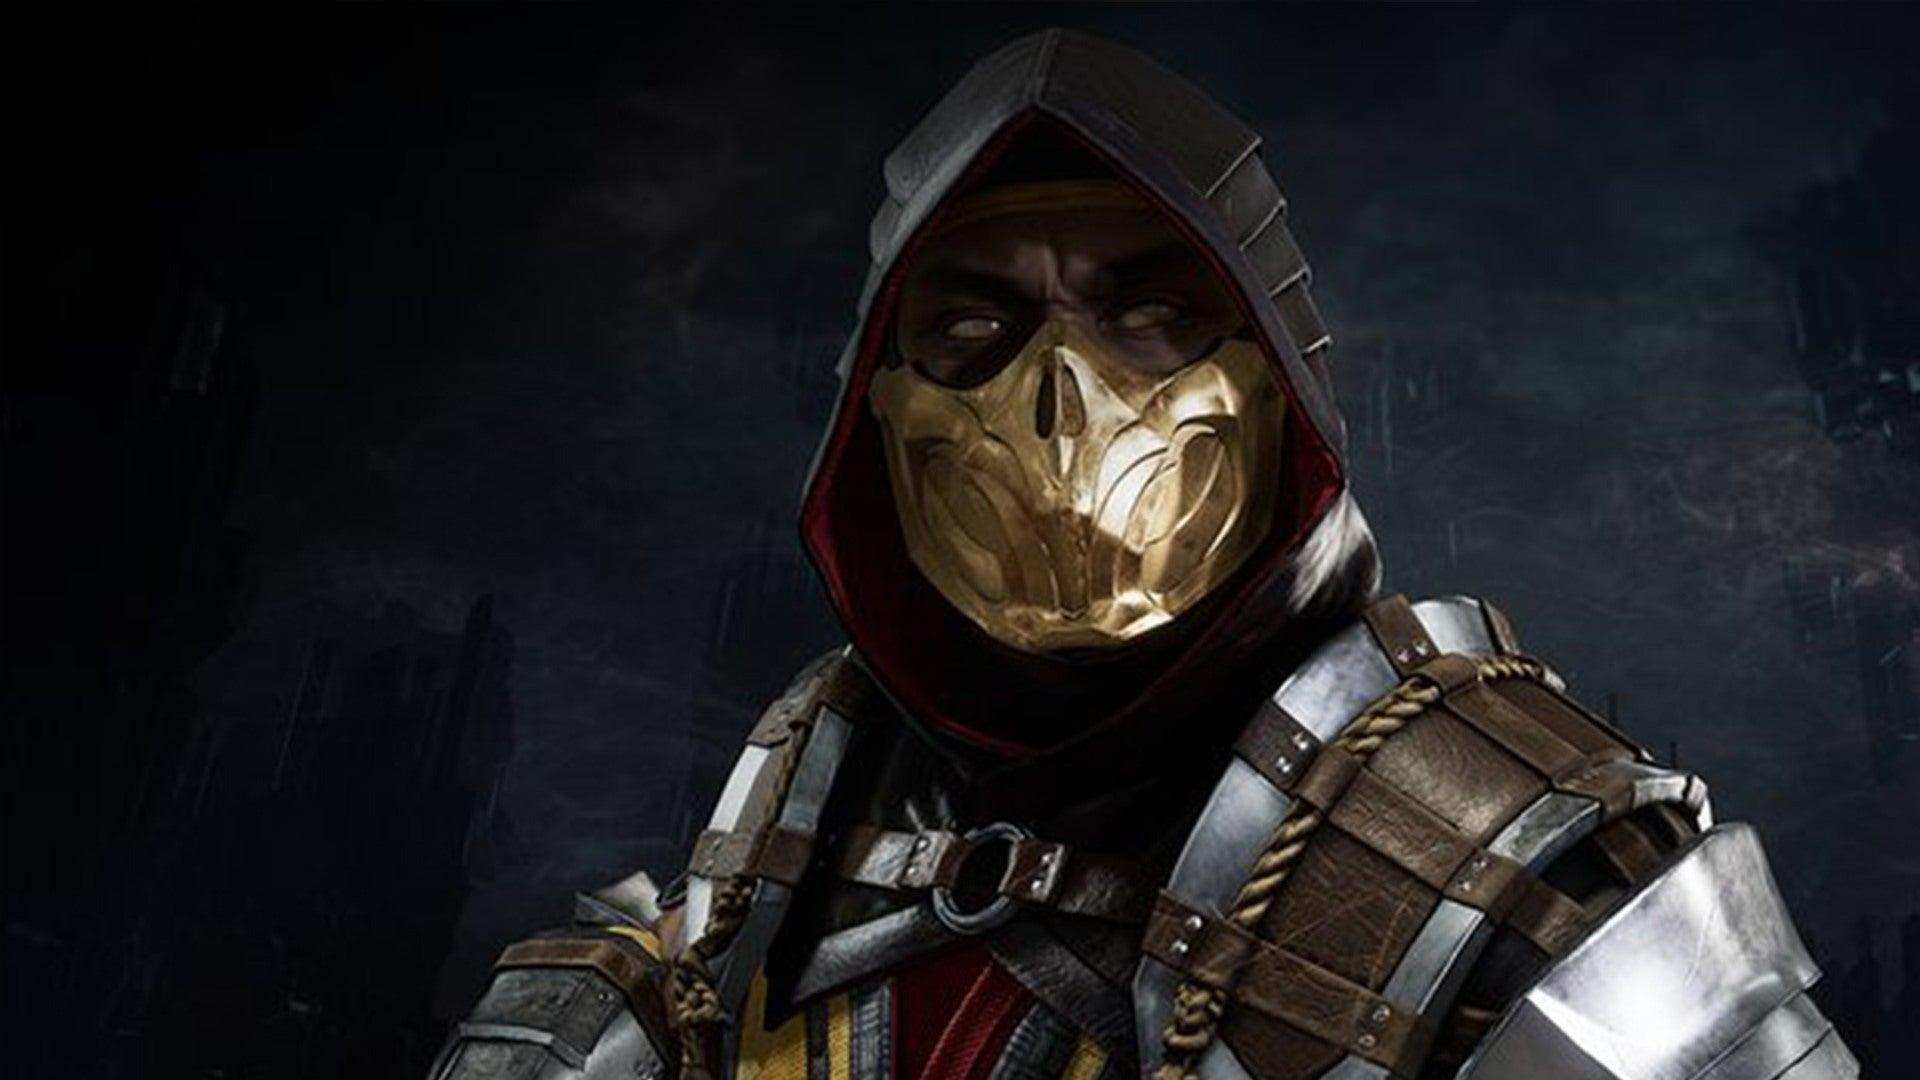 Mortal Kombat 11 Gameplay Breakdown with Ed Boon - IGN.com